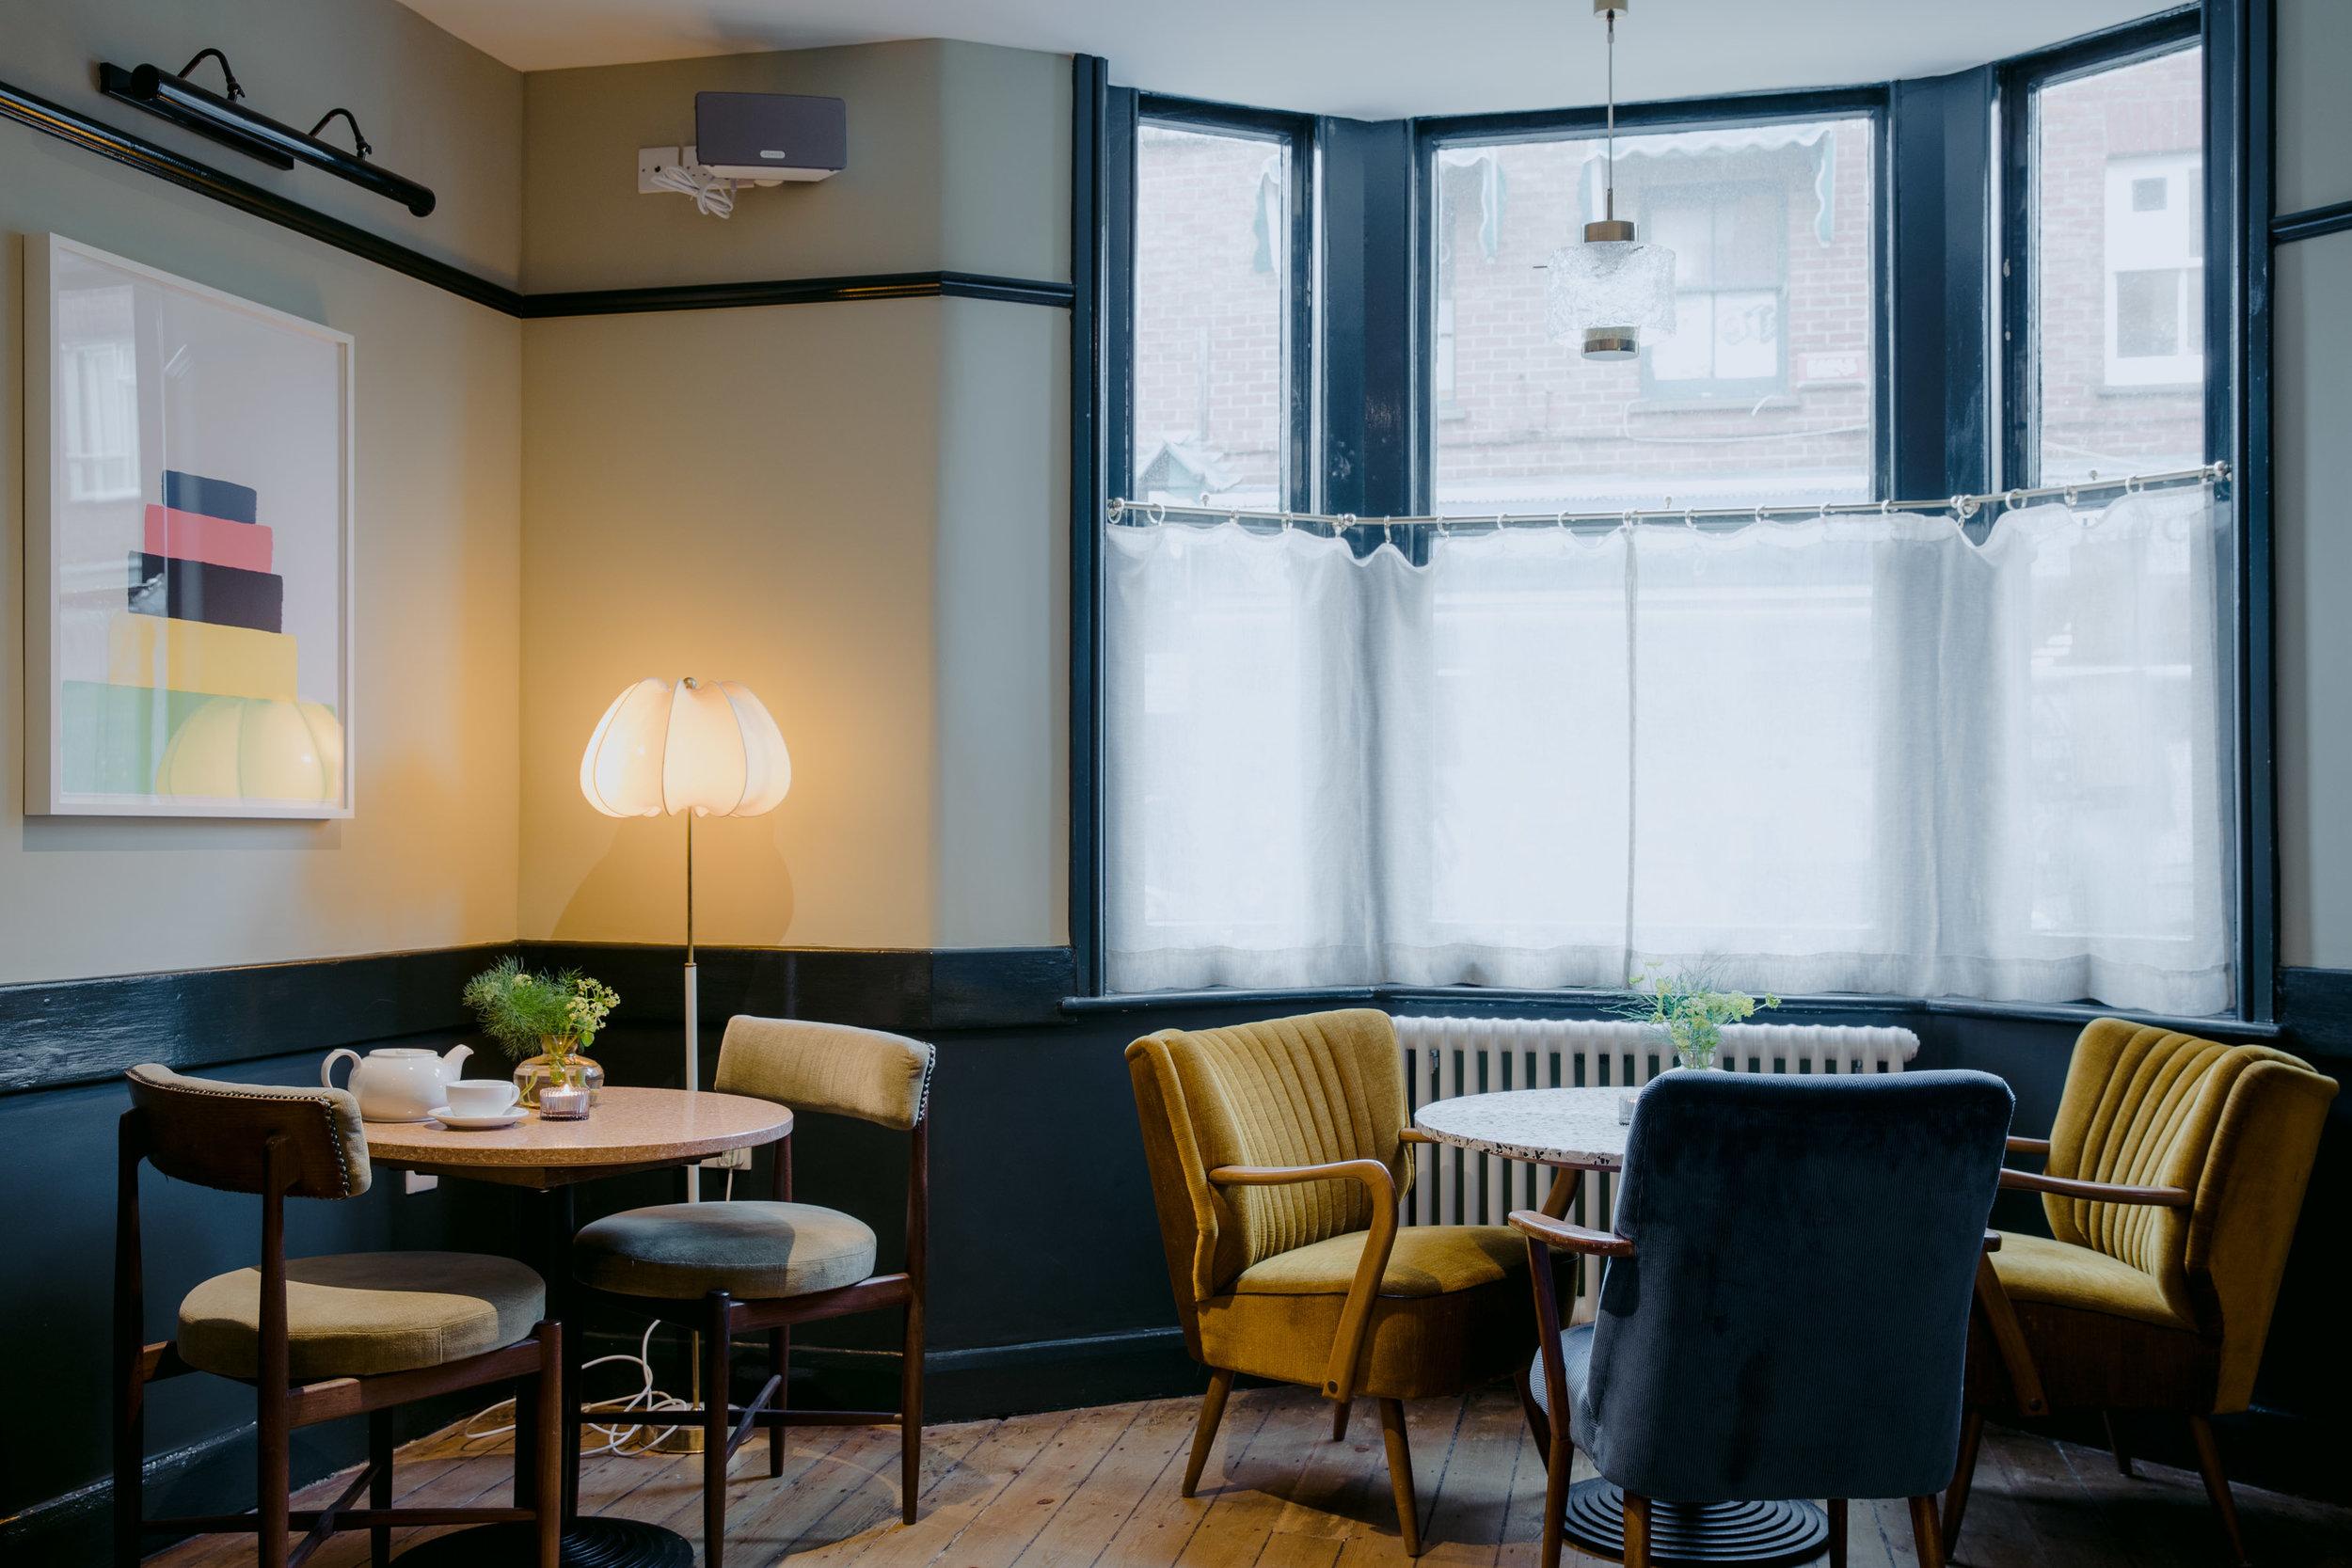 deal-hotel-the-rose-kent-coast-interior-design-support-local-magazine-styling-refurb-1-6.jpg